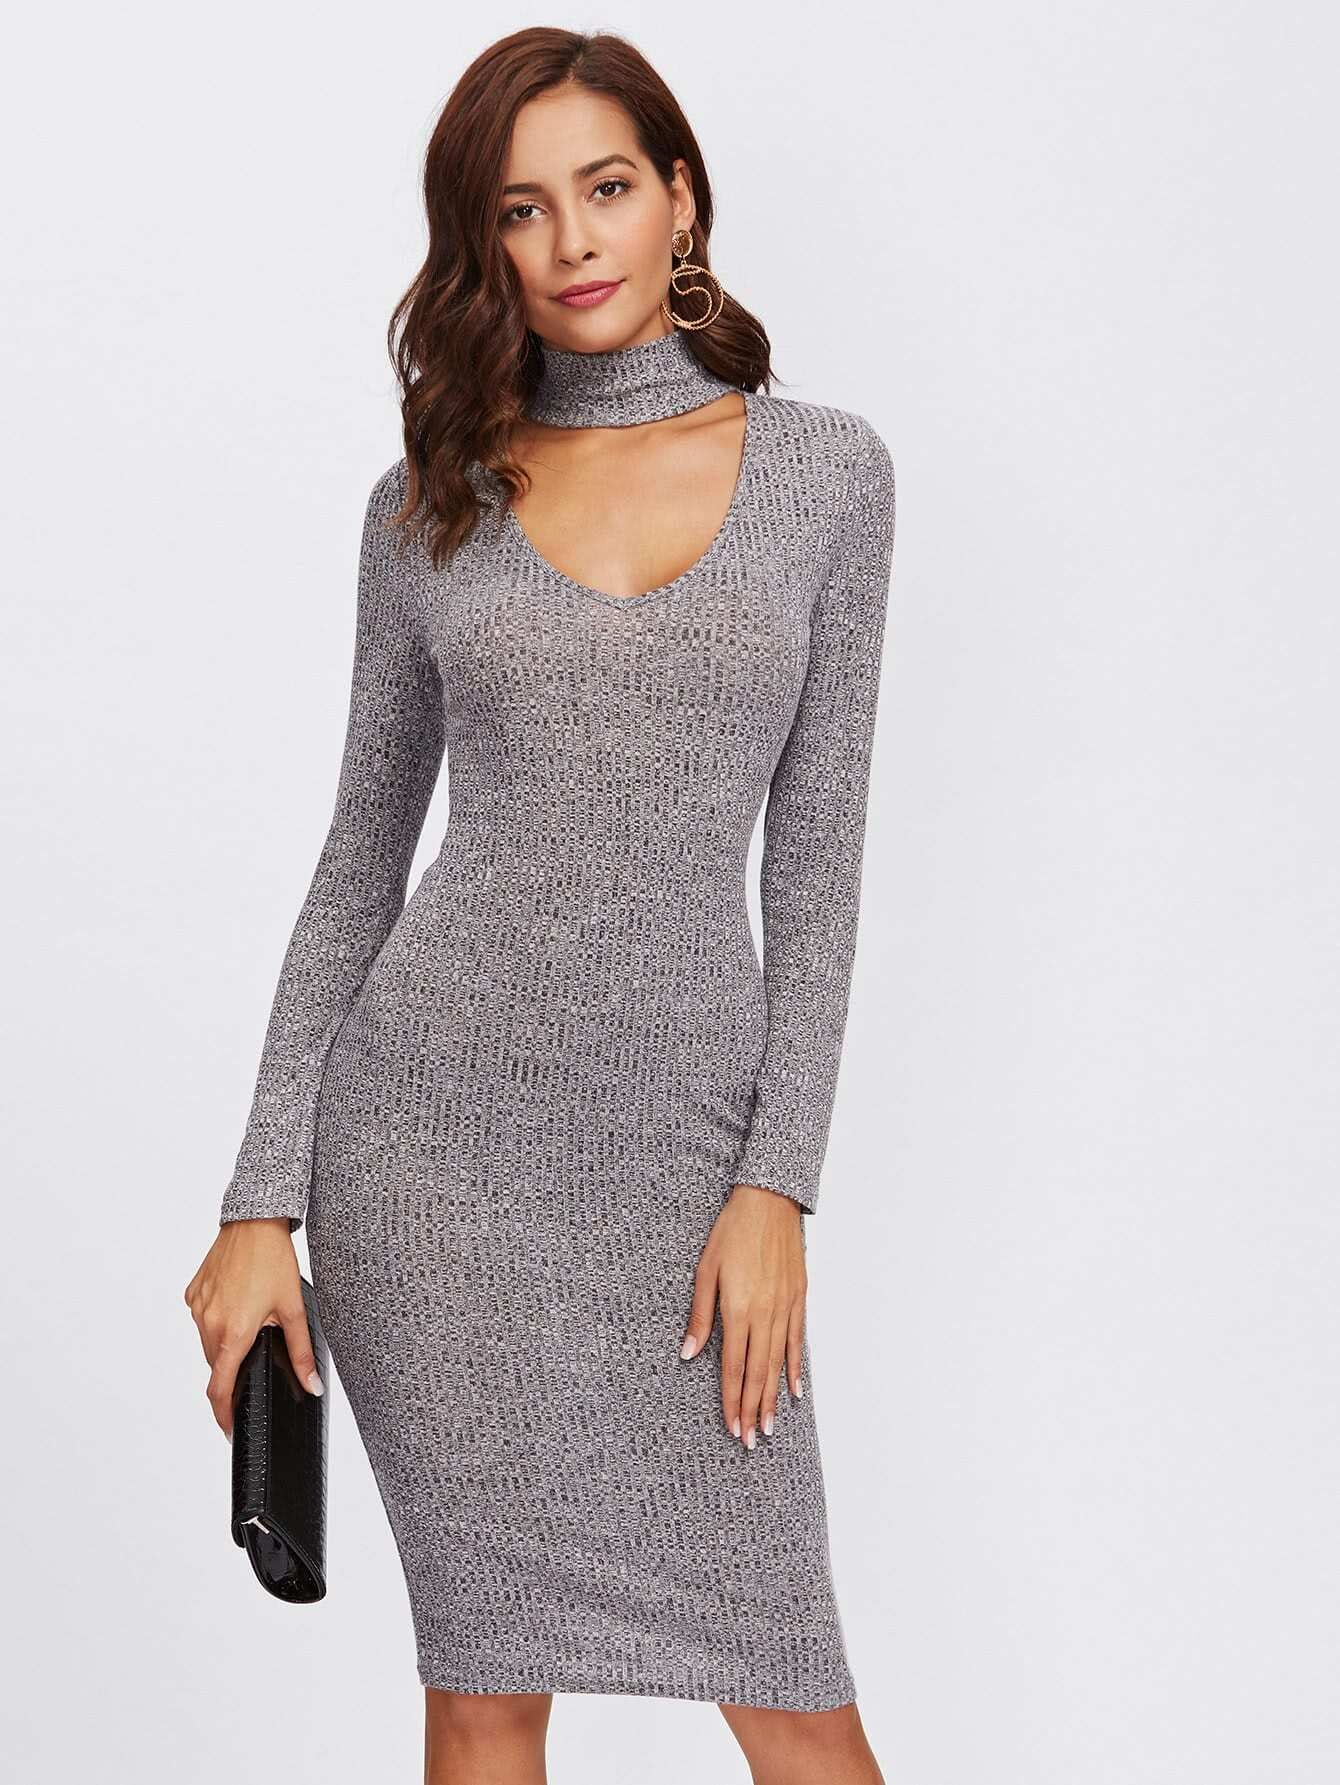 Choker Neck Rib Knit Marled Dress dress171024717